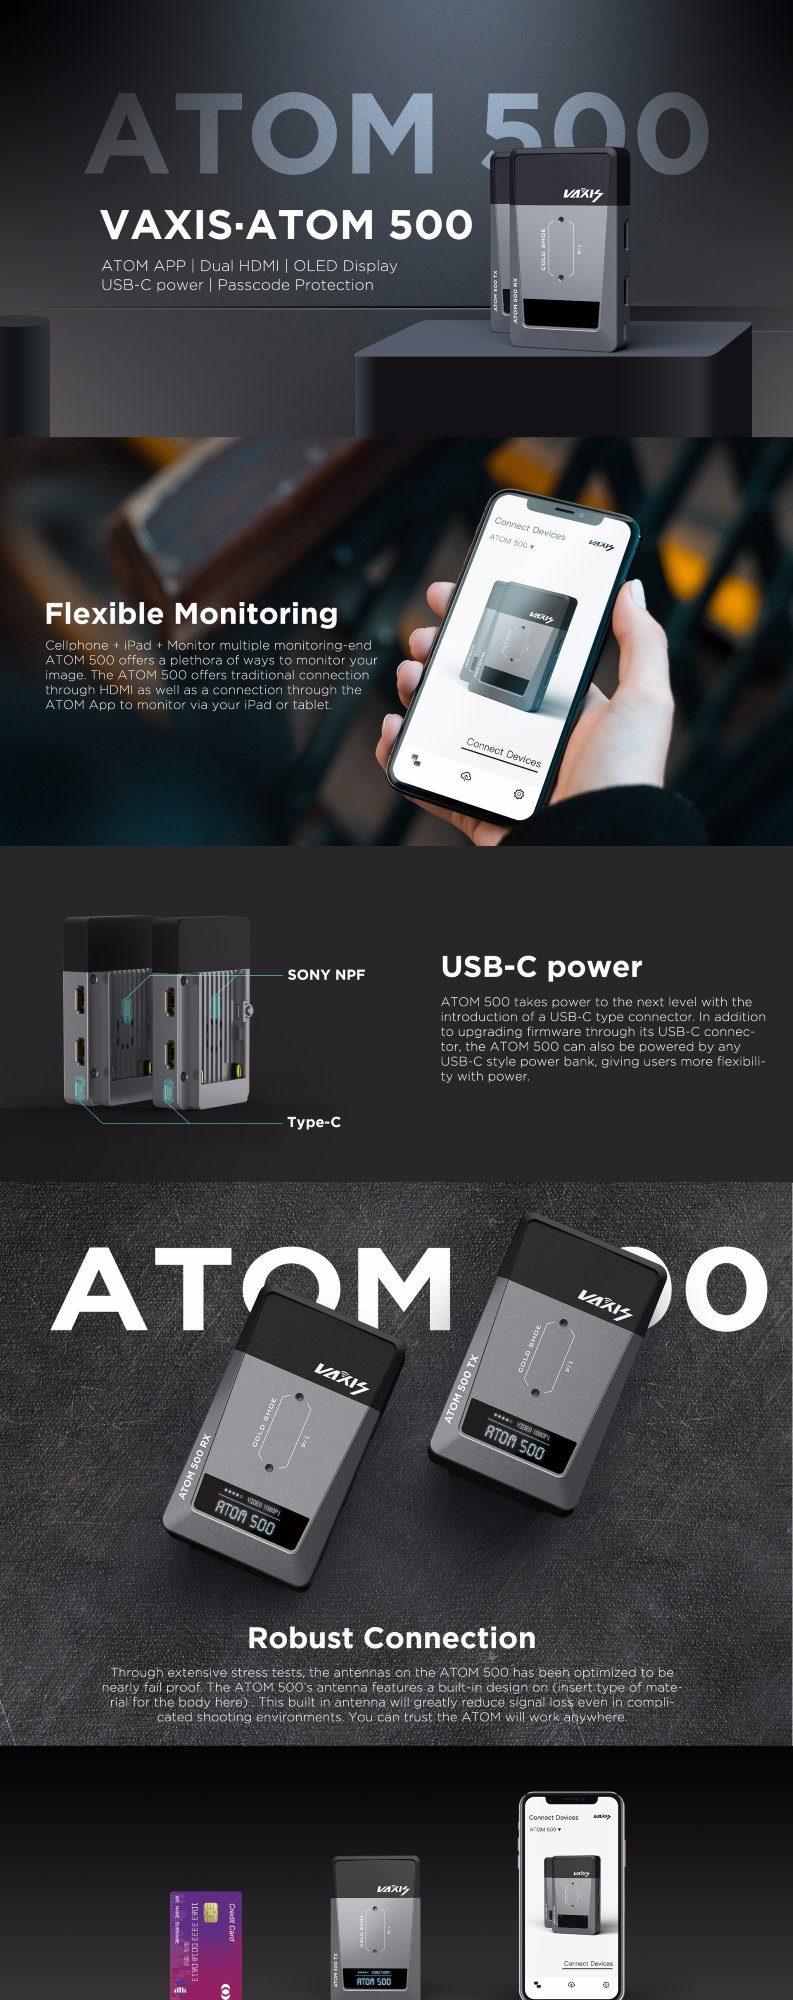 Atom 500